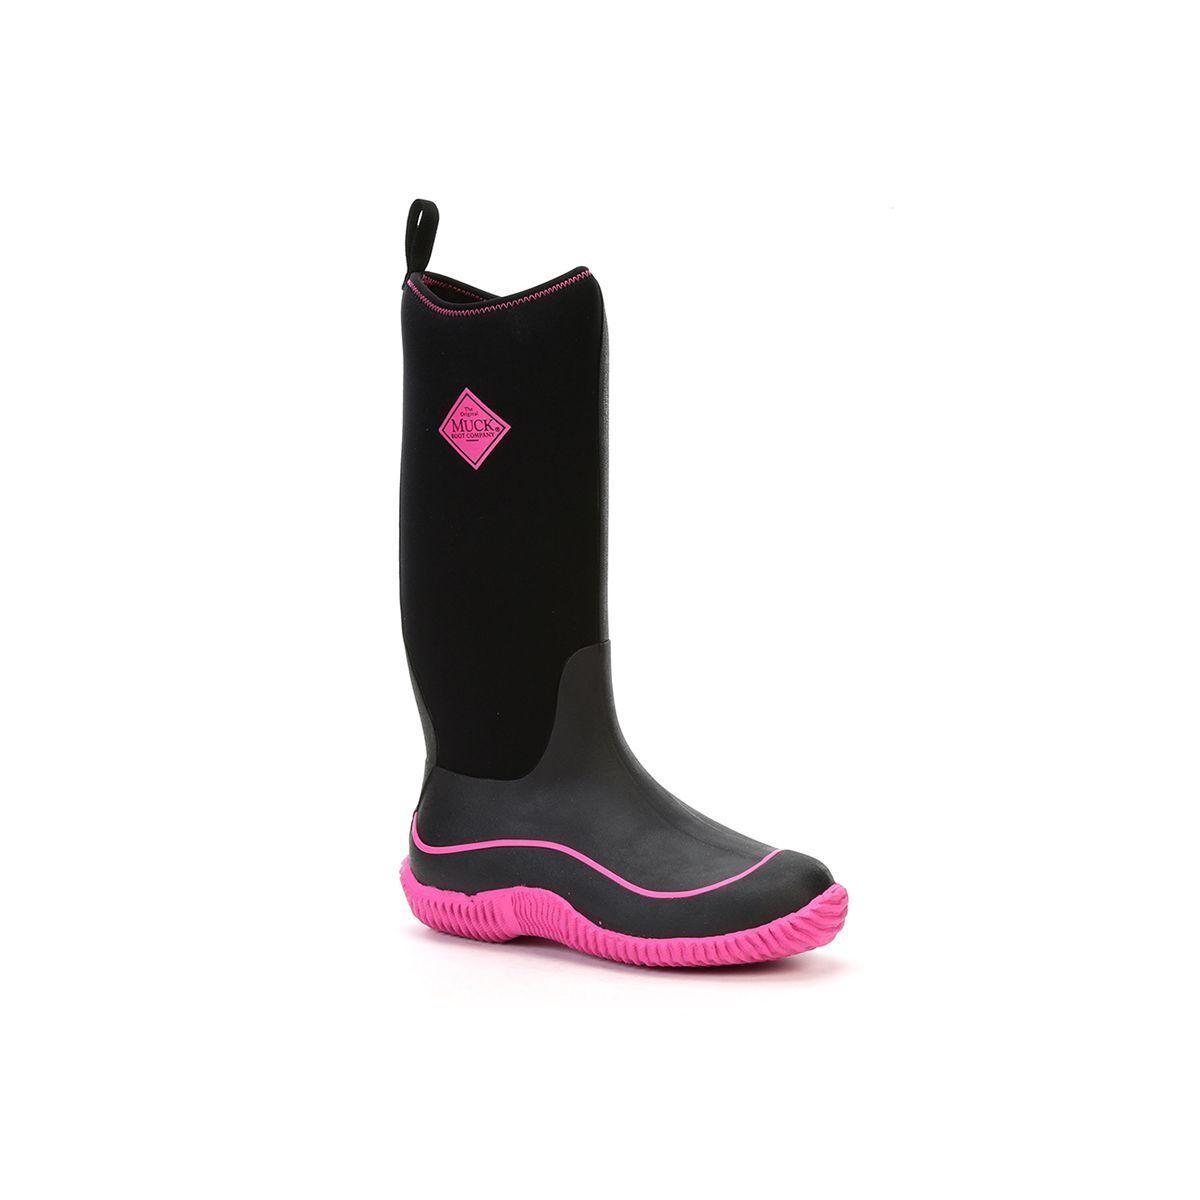 Muck Boots Company Women's HALE, BLACK-HOT PINK, Neoprene Rubber Snow